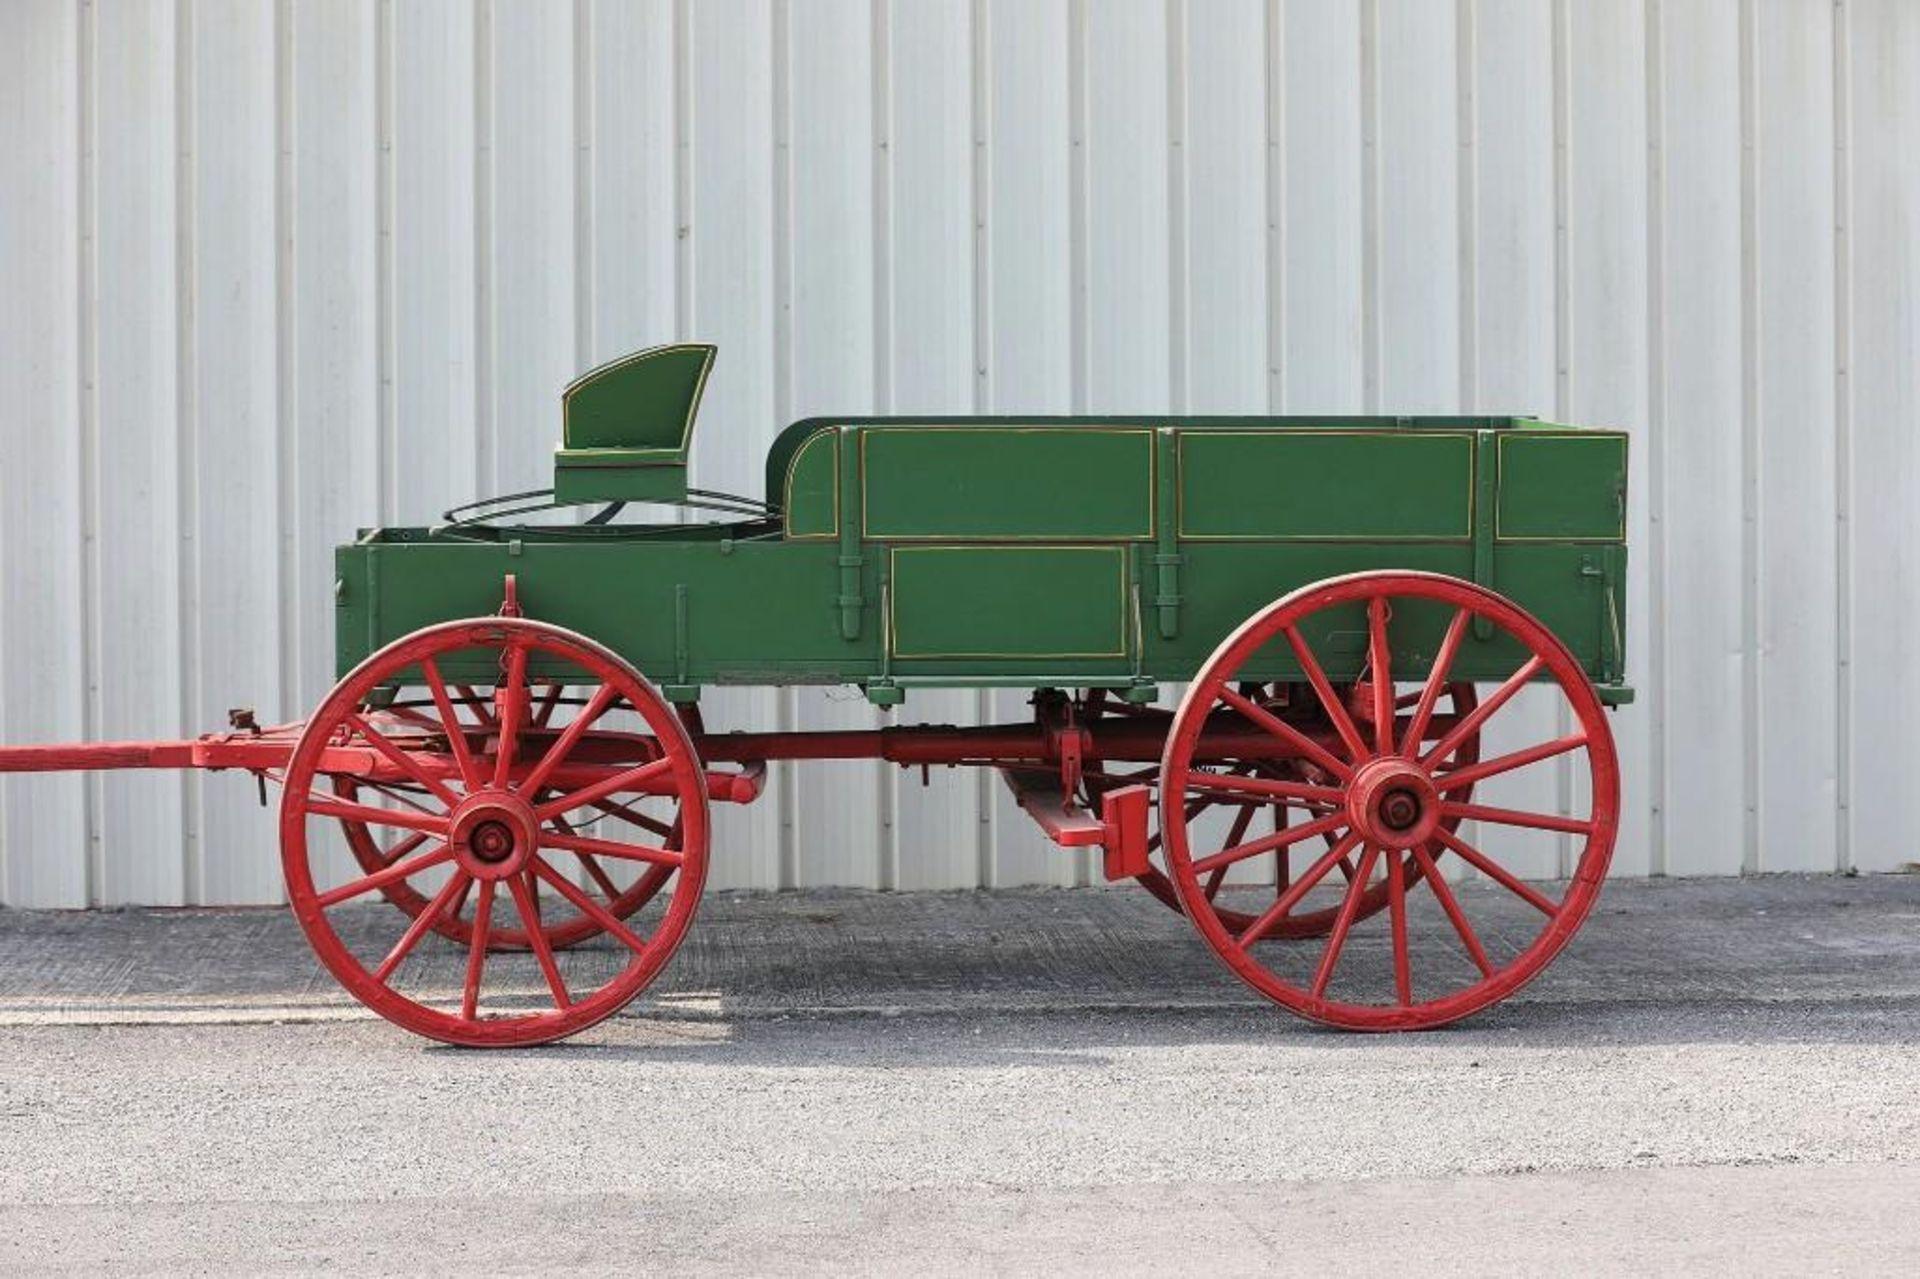 Restored Box Bed Farm Wagon, Original Running Gear & Hardware, Marked 75W